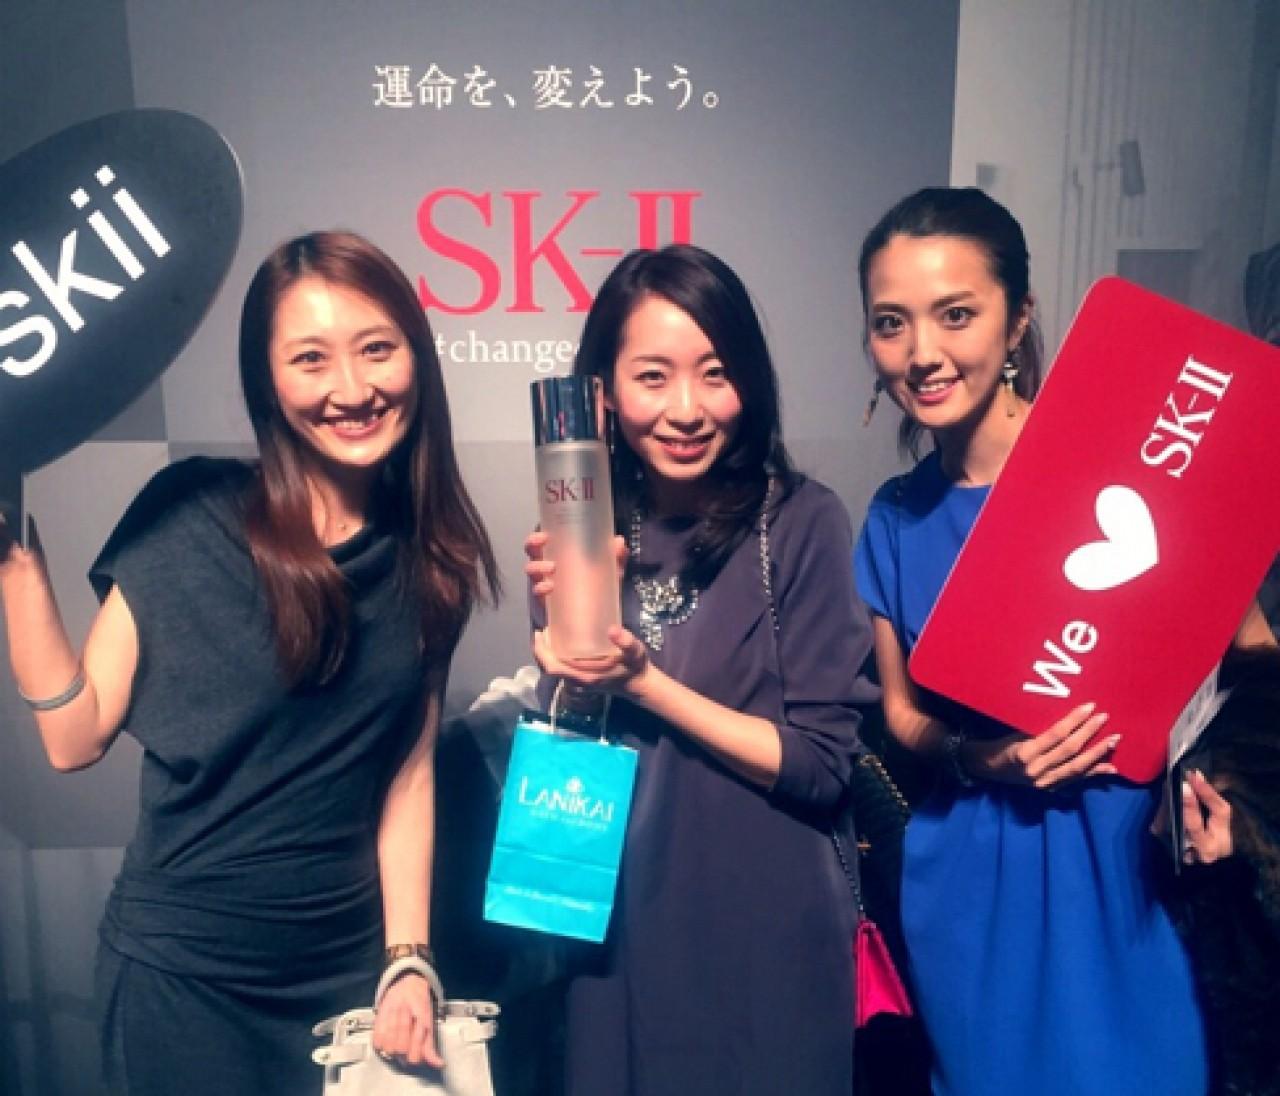 SK-IIのイベントに参加してきました!